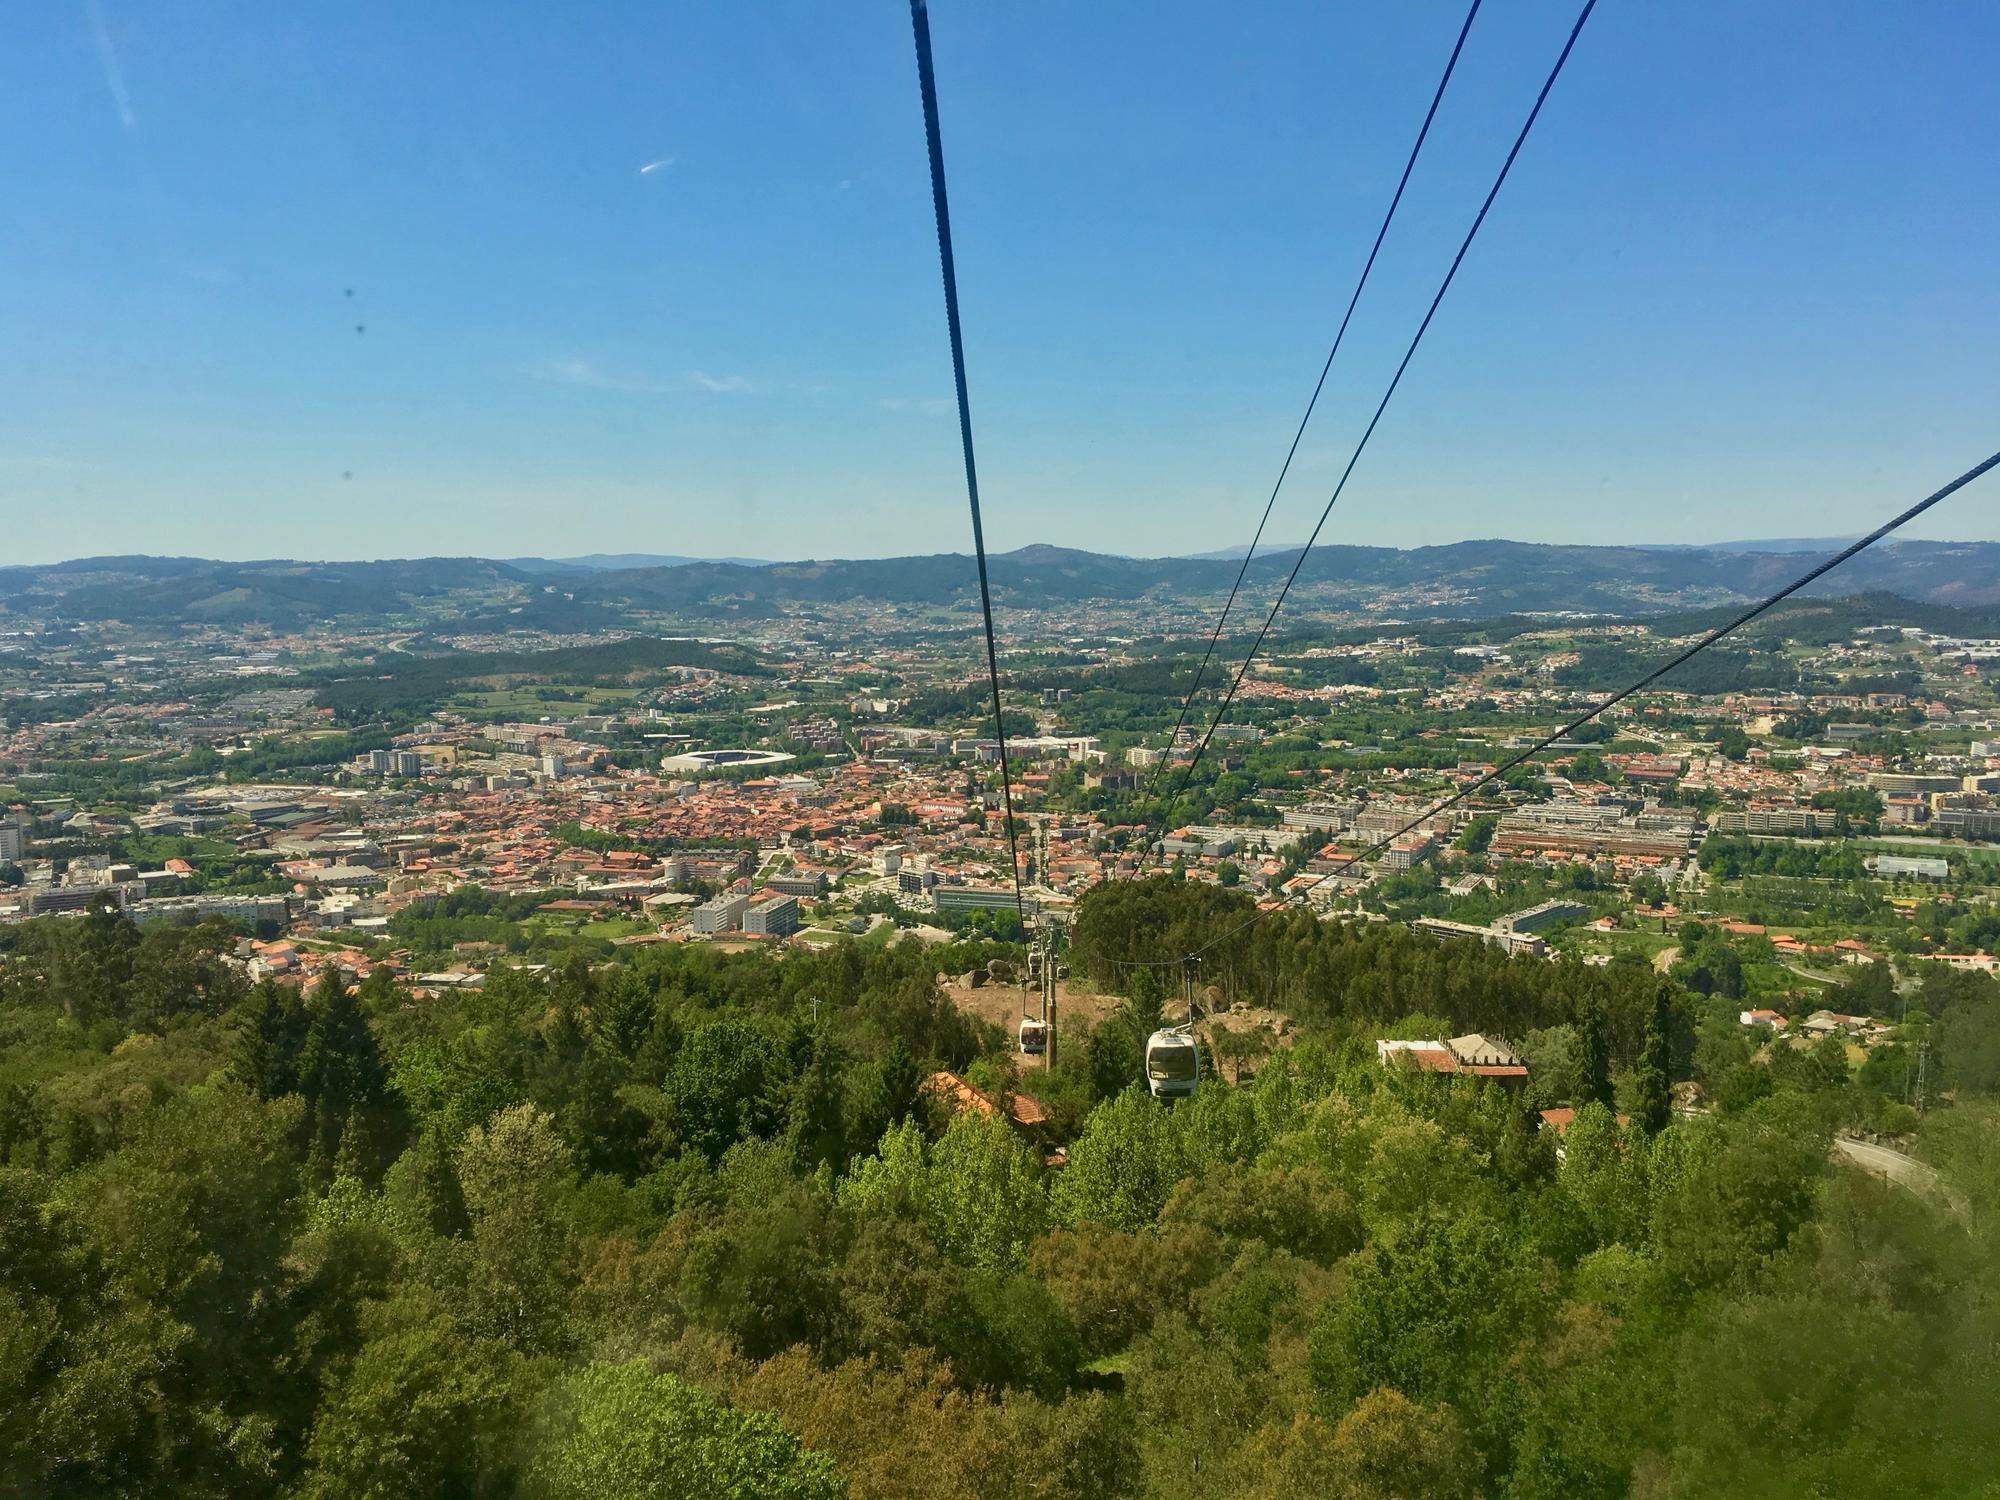 🇵🇹 Гимарайнш, Португалия, май 2019.